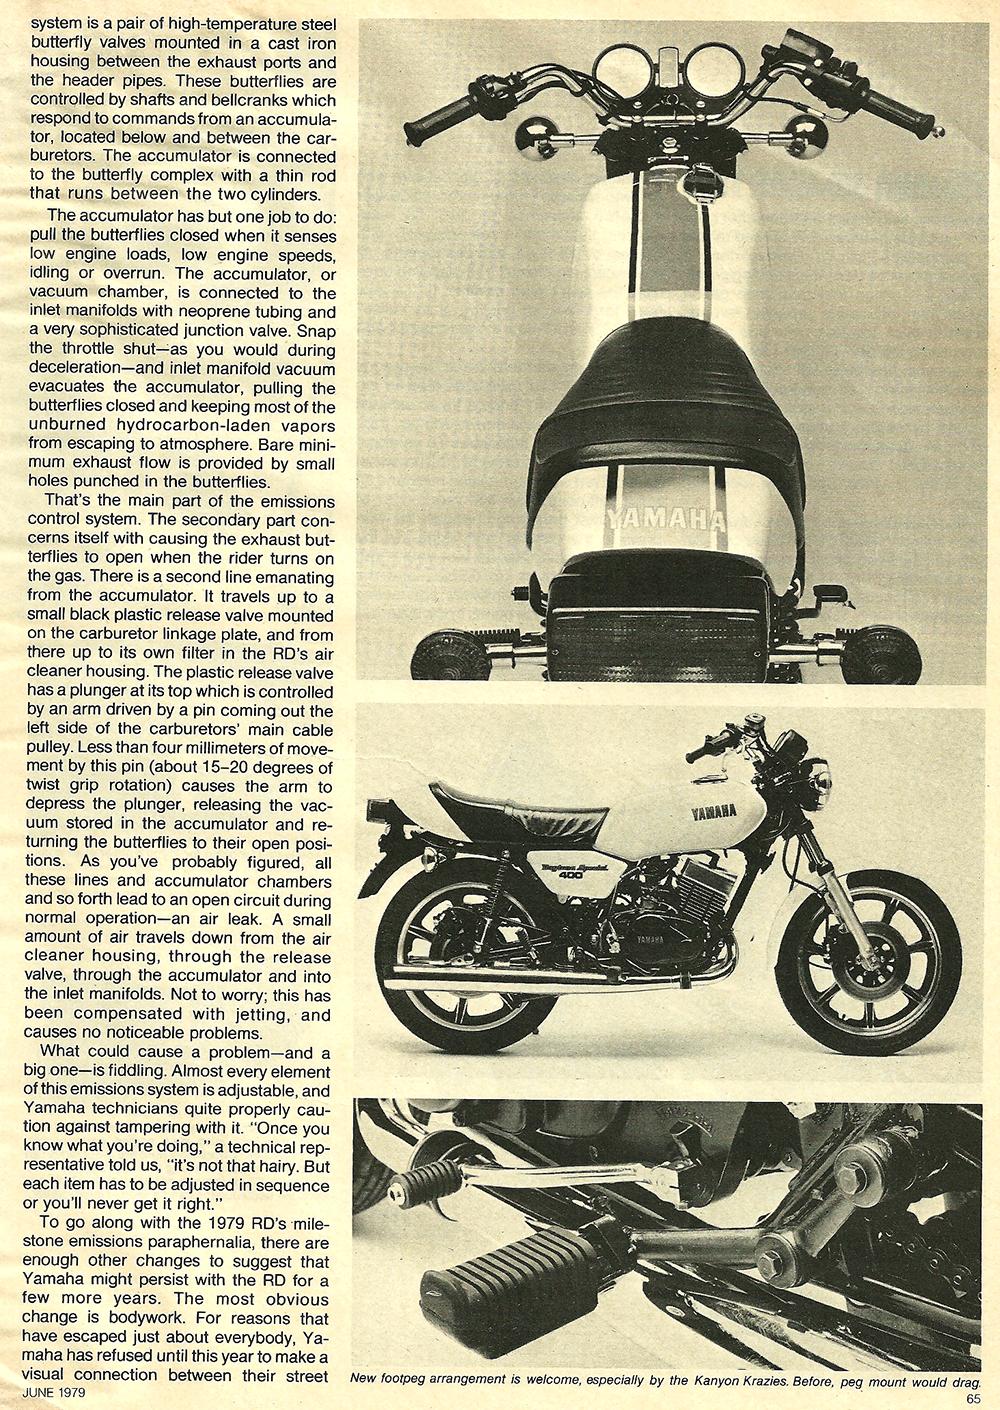 1979 Yamaha RD400F road test 04.jpg